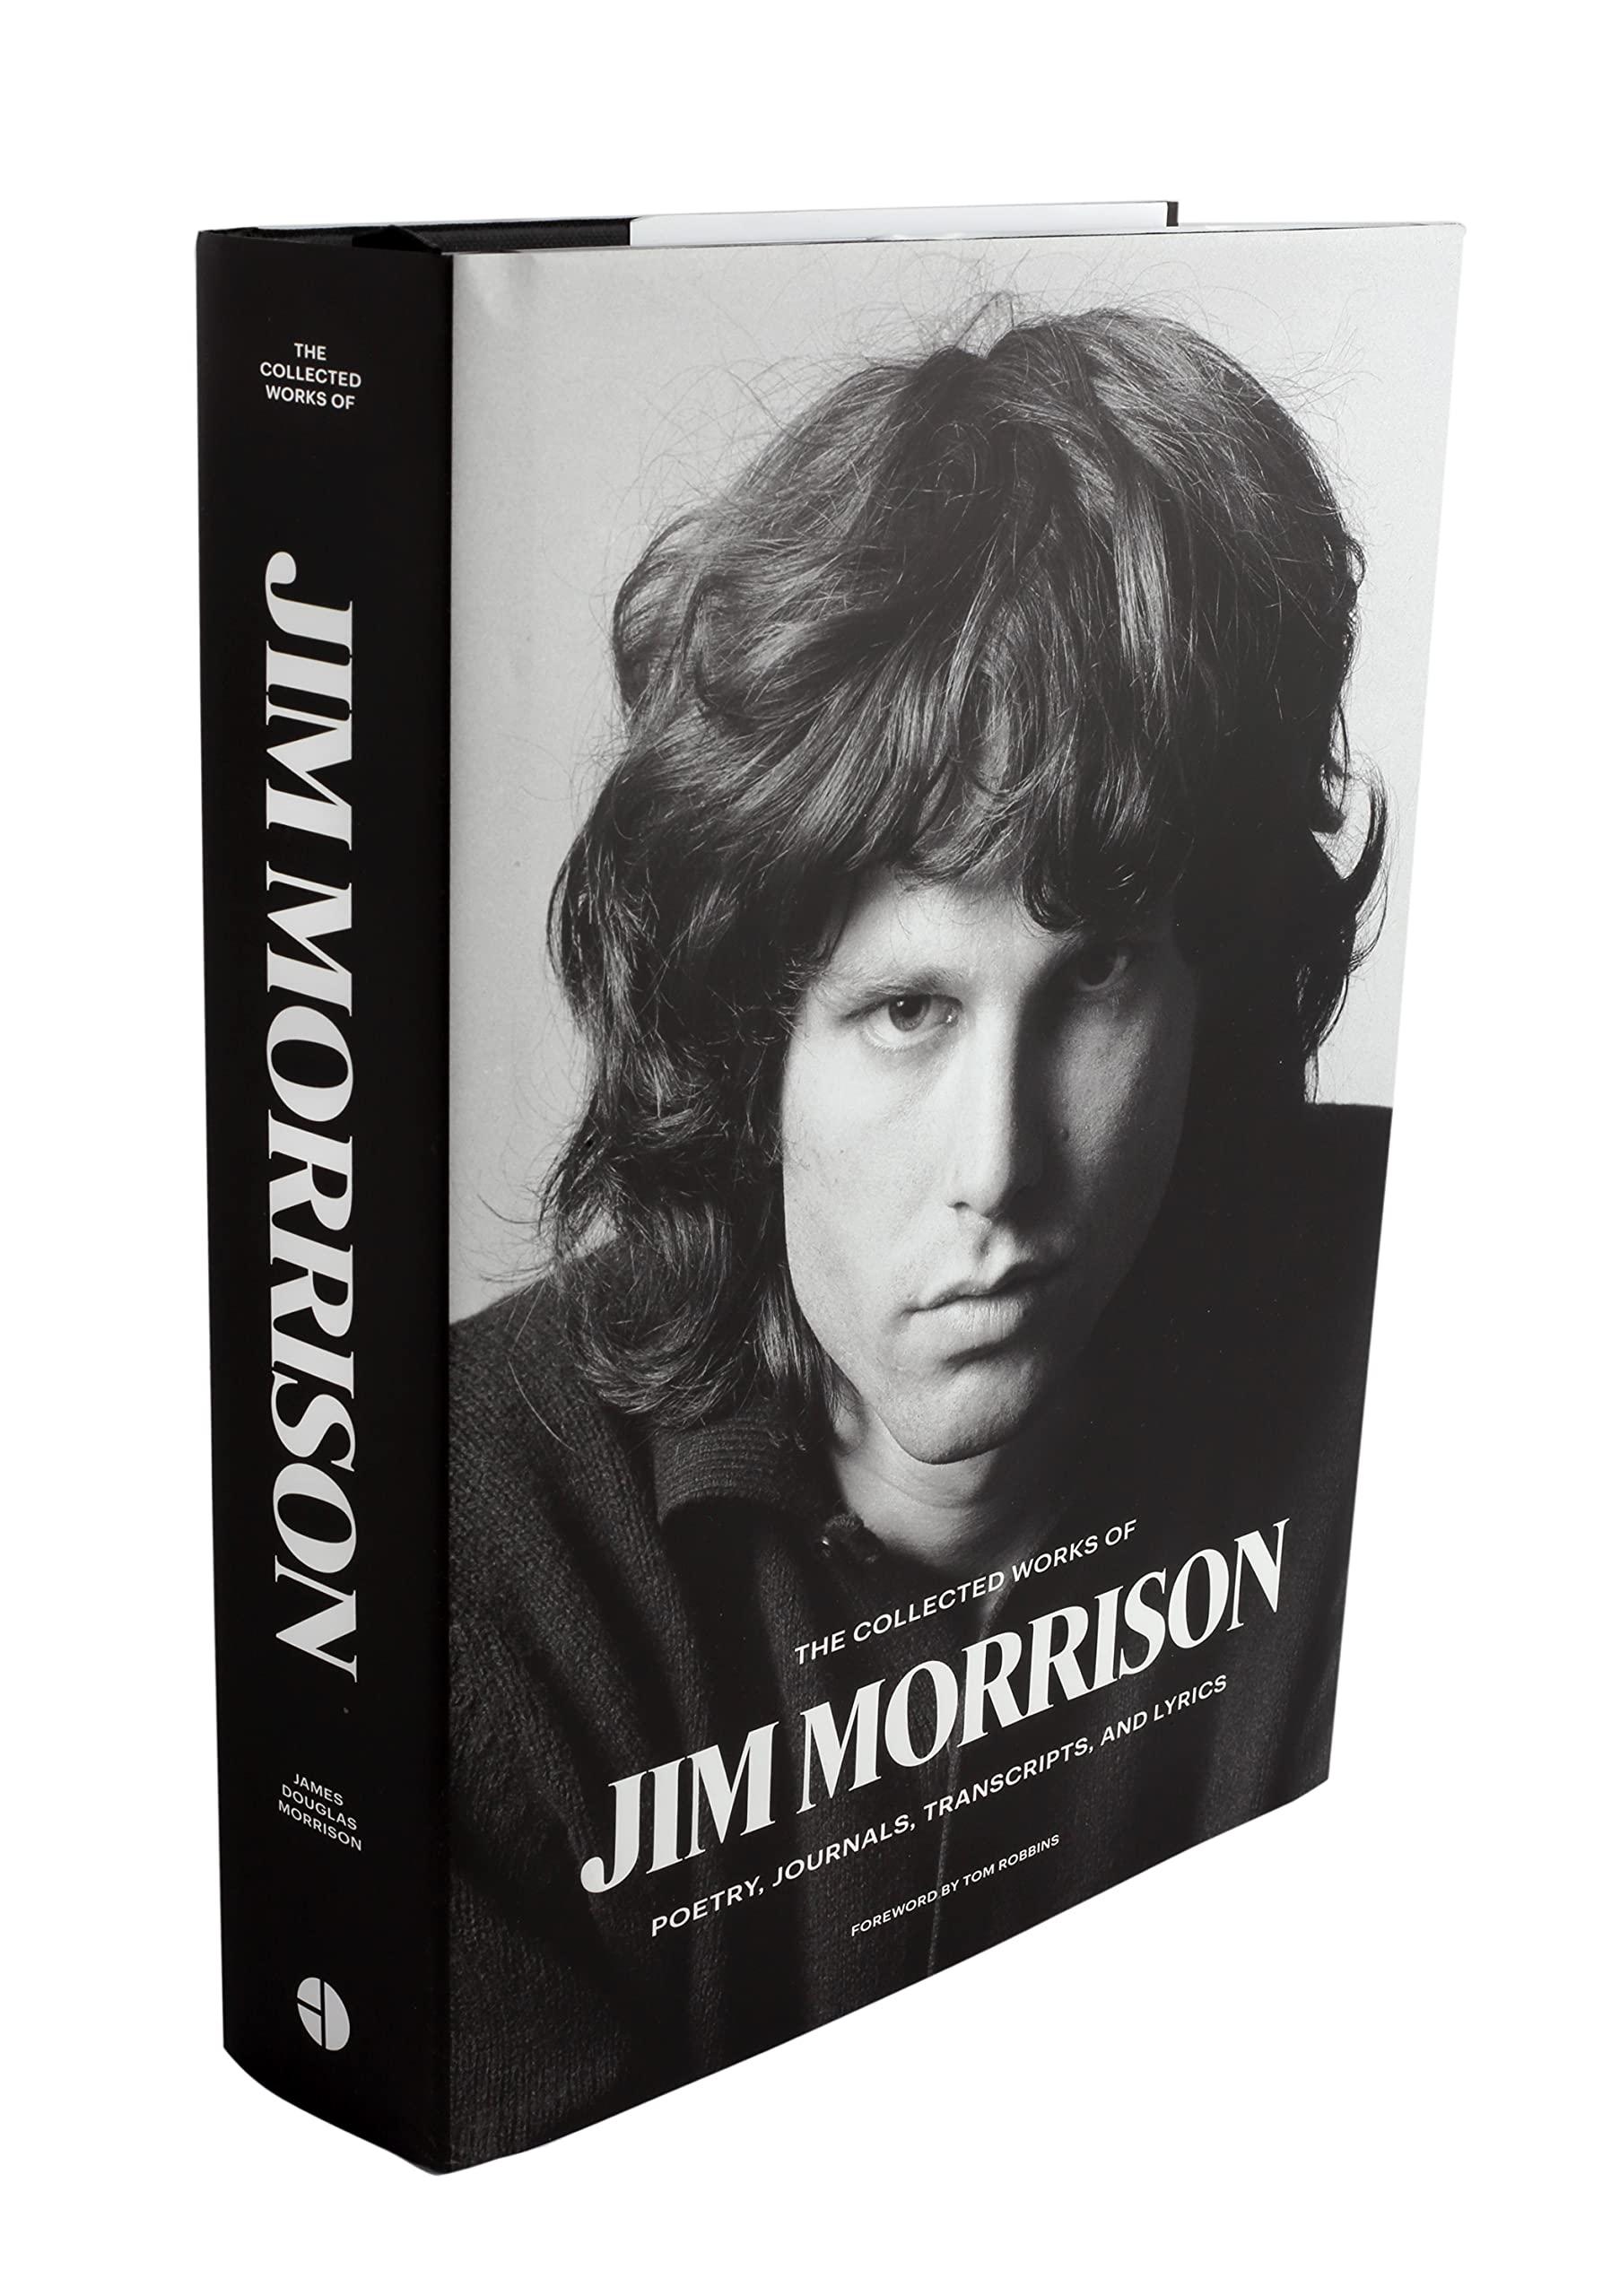 The Collected Works of Jim Morrison: Poetry, Journals, Transcripts, and Lyrics: Amazon.es: Morrison, Jim, Robbins, Tom: Libros en idiomas extranjeros